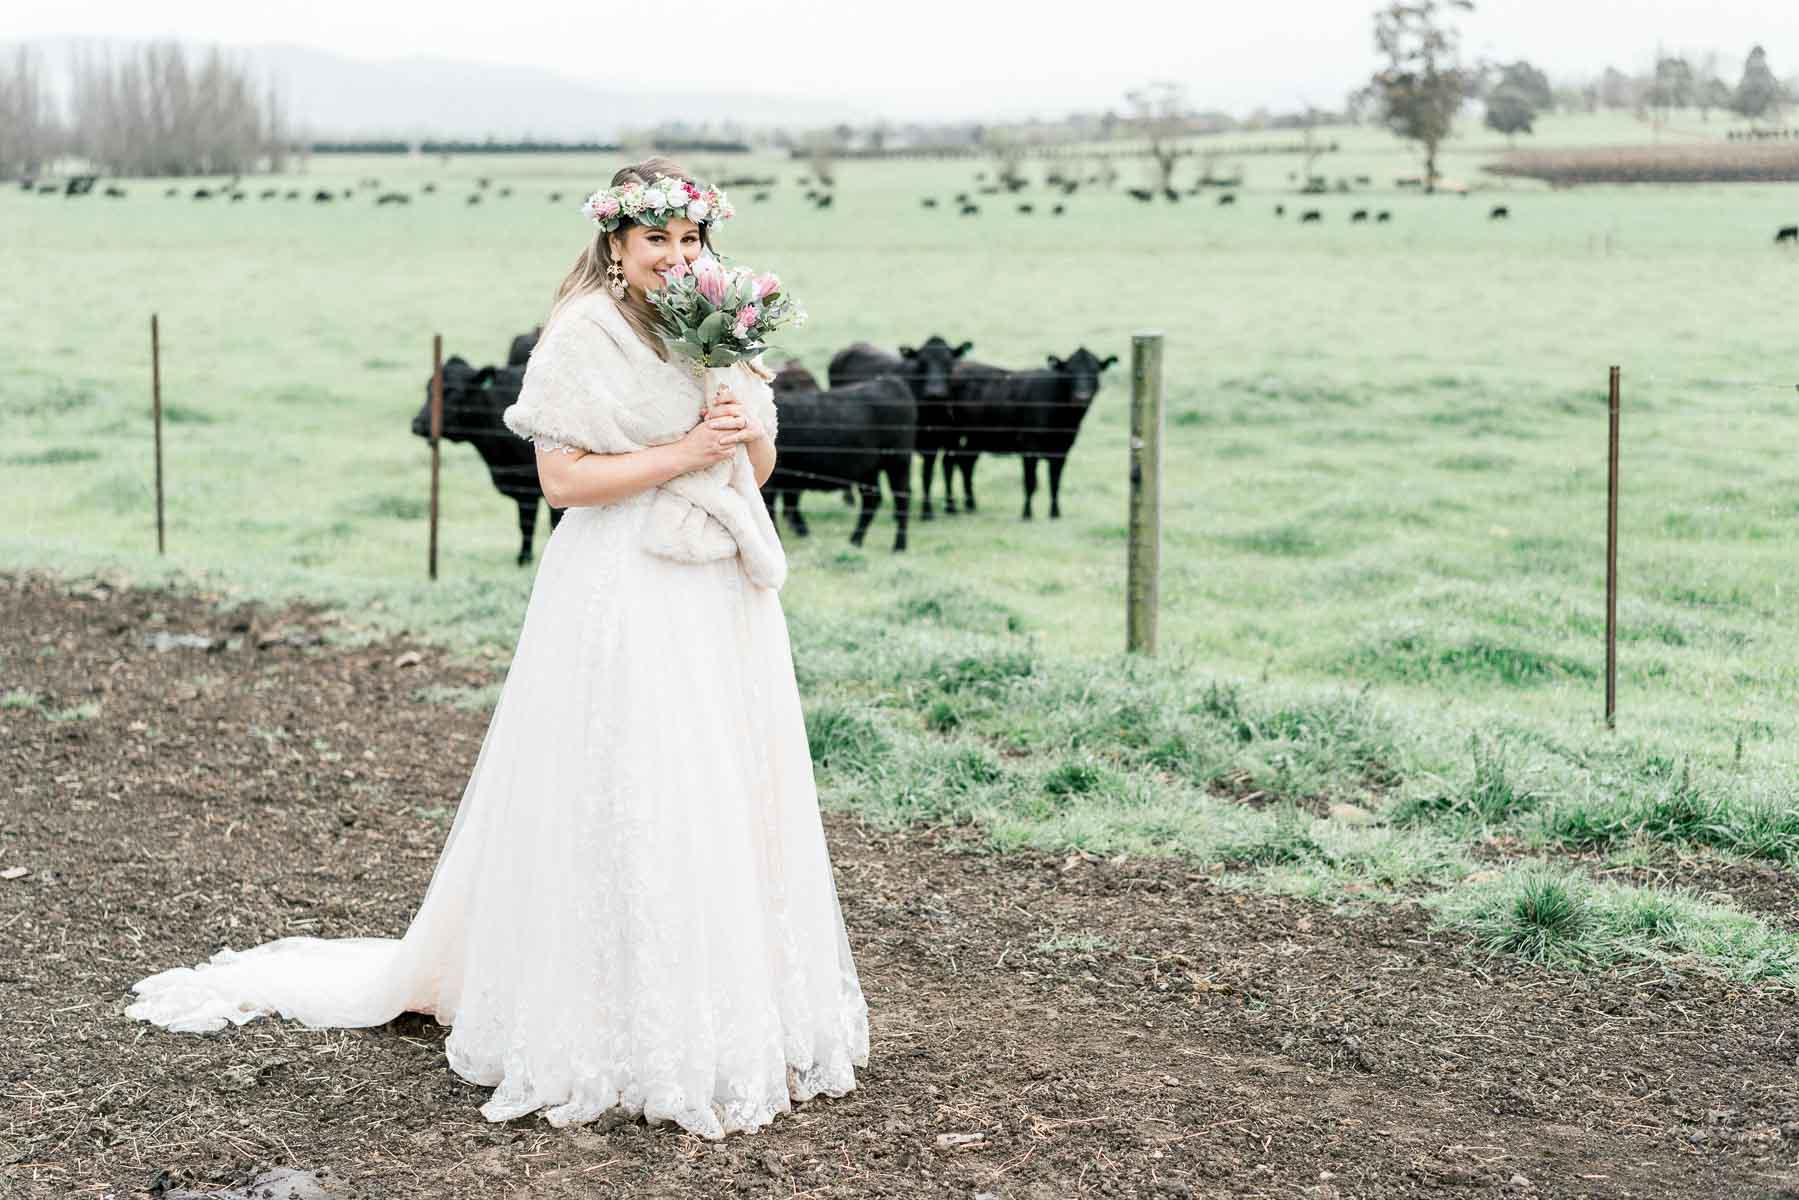 adams-farm-coldstream-yarra-valley-wedding-heart+soul-weddings-kel-jarryd-05691.jpg